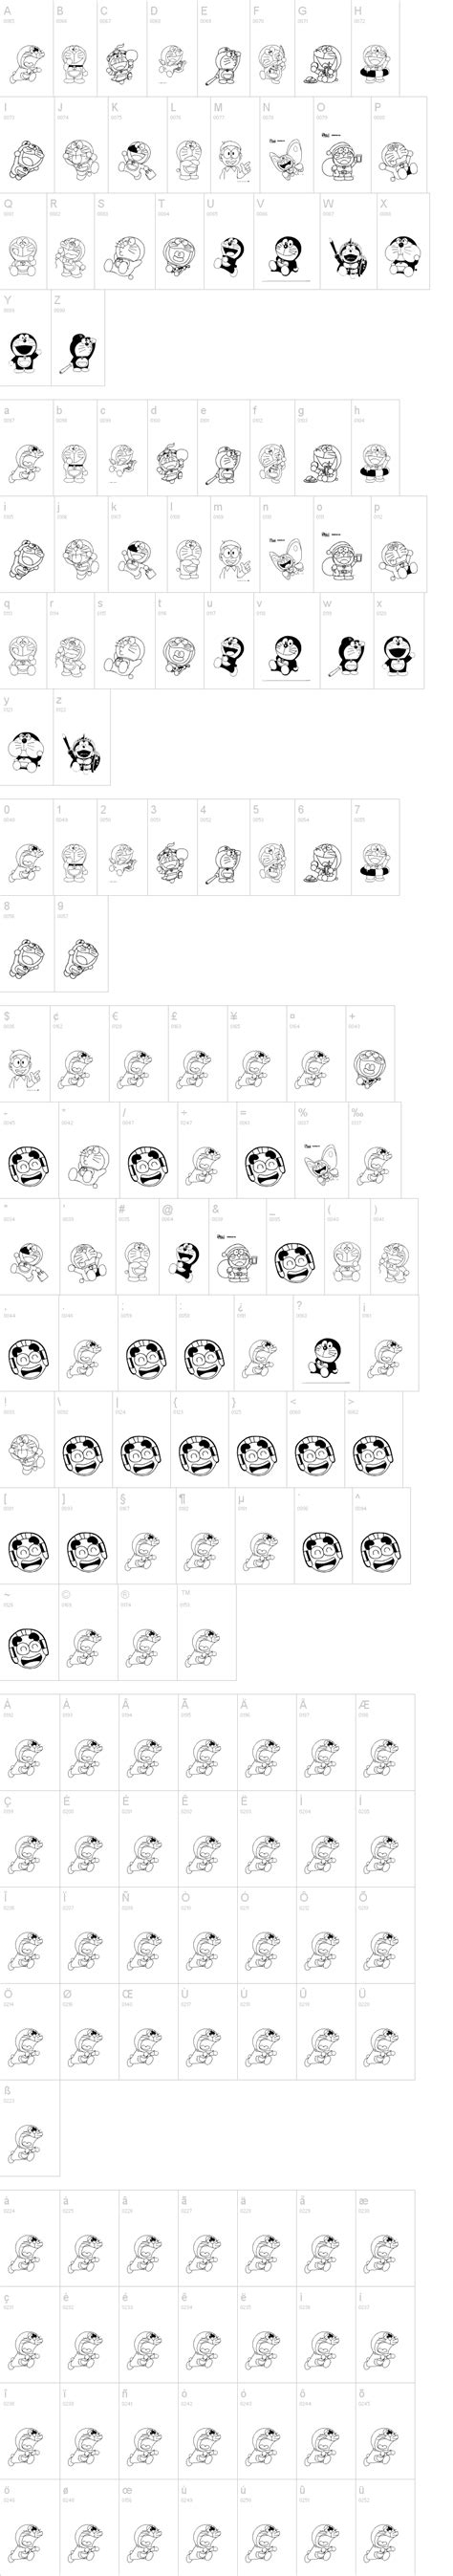 Dafont Doraemon   doraemon slalala font dafont com